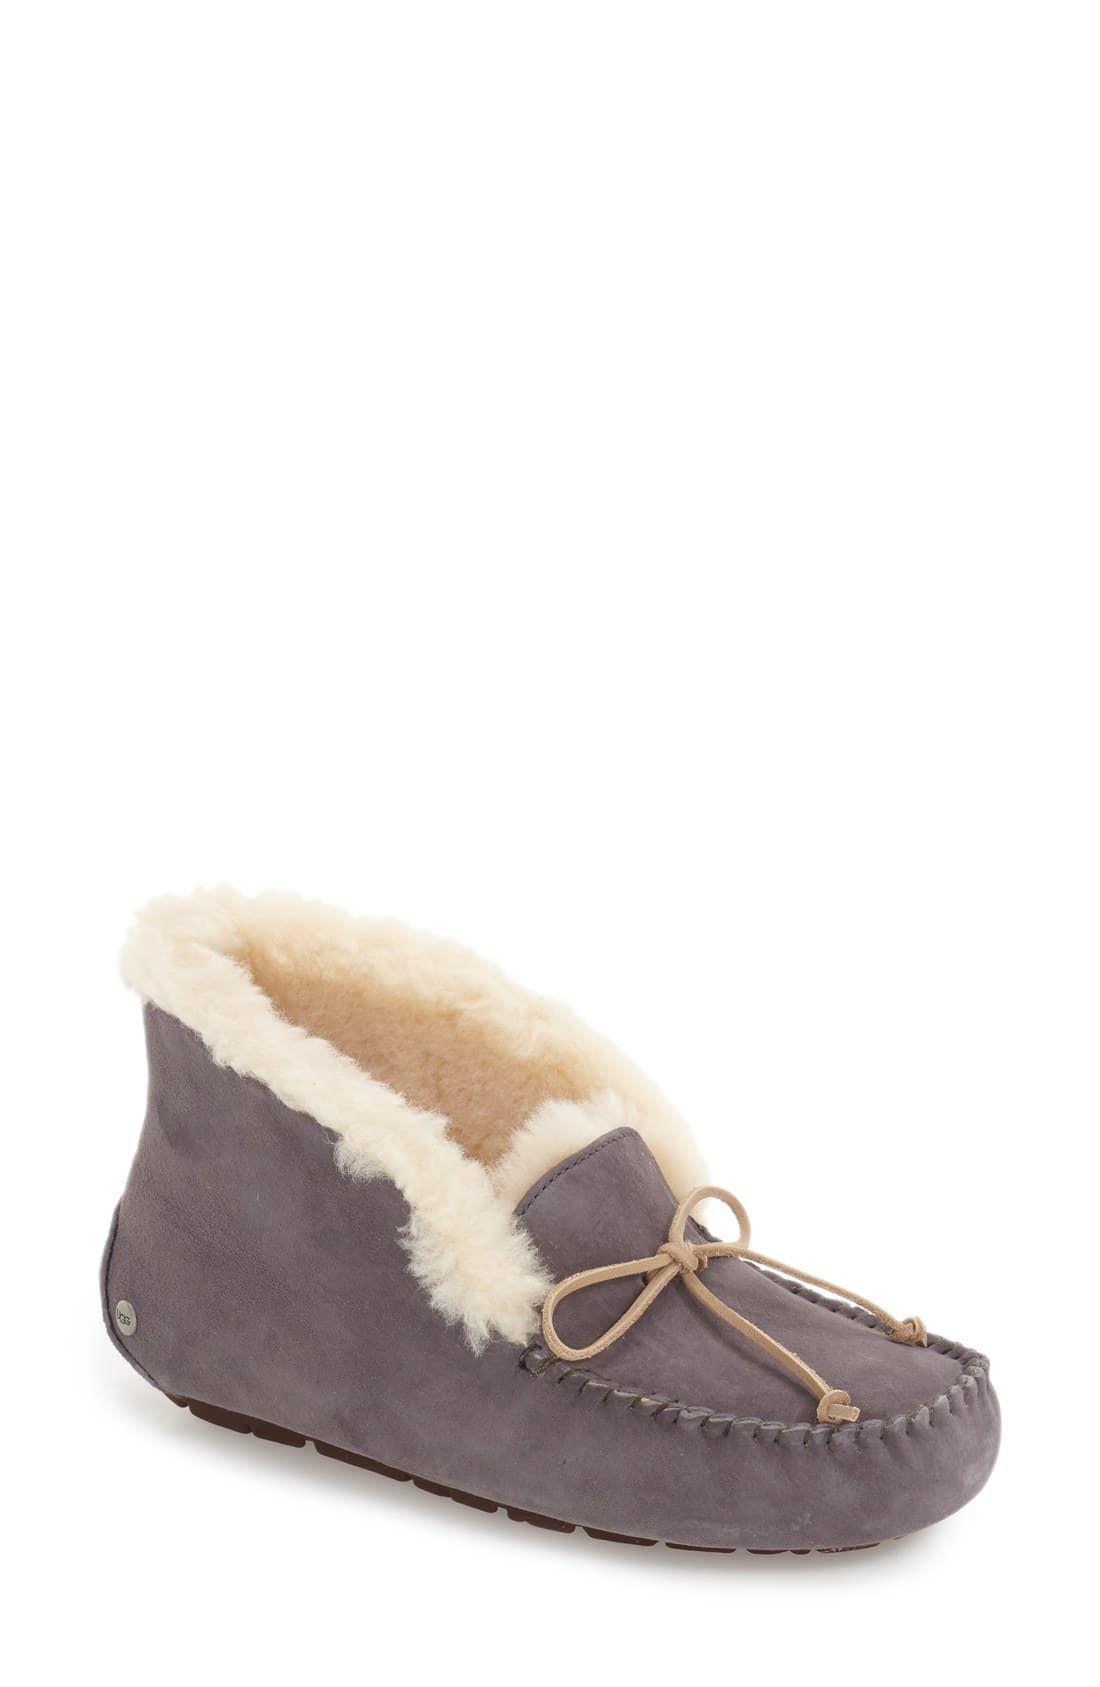 734305d221b Women's Ugg Uggpure™ Alena Suede Slipper Bootie, Size 5 M - Blue in ...